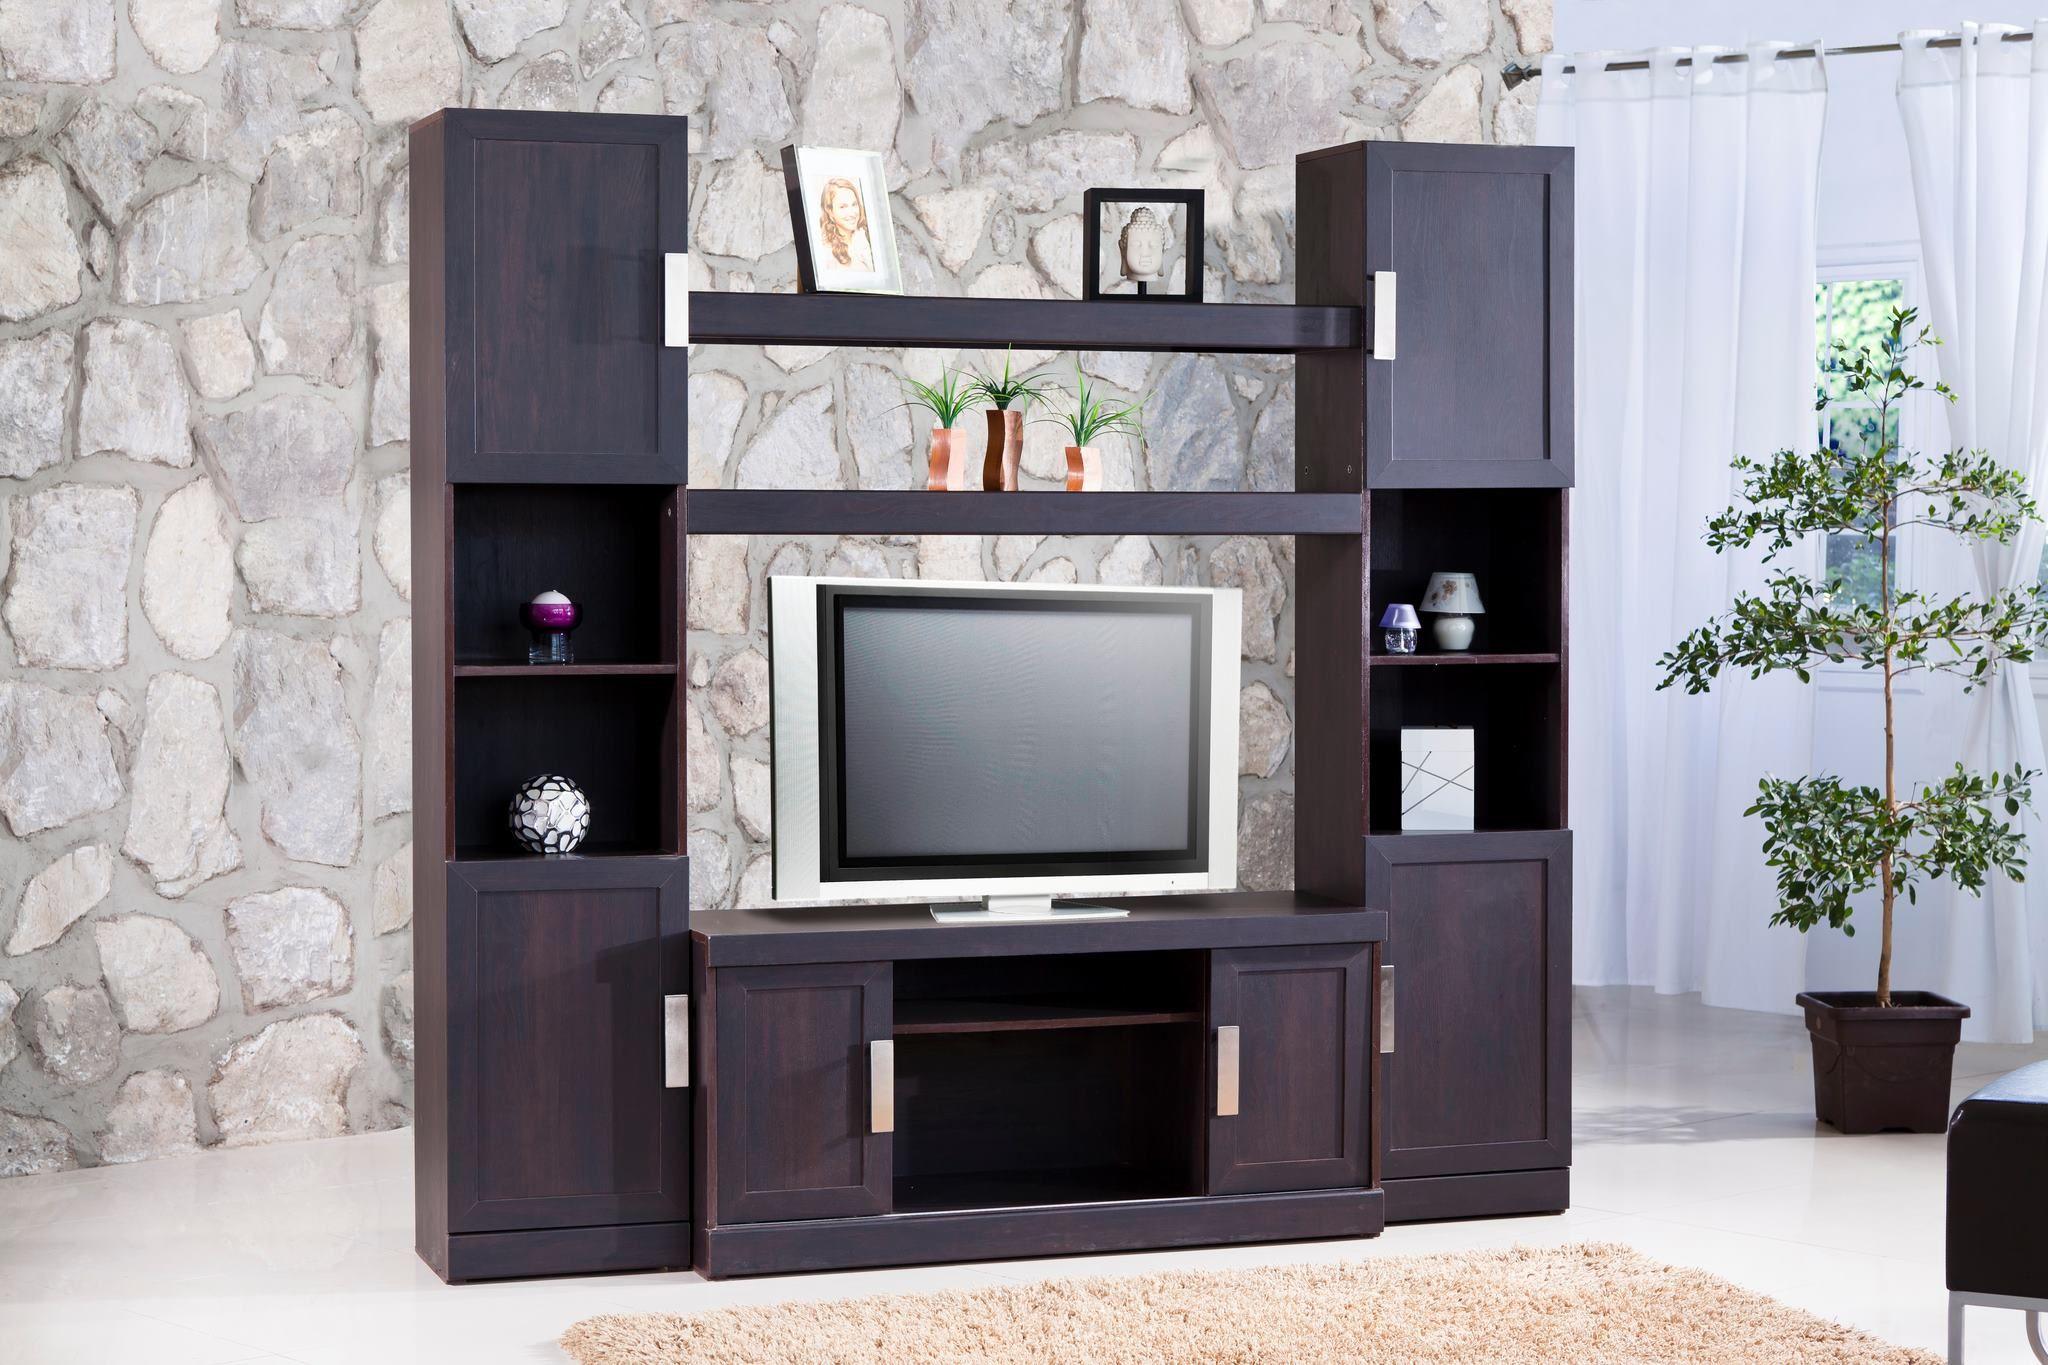 Stand De Tv Troncoso Muebles Muebles Troncoso Pinterest # Neat Muebles Merida